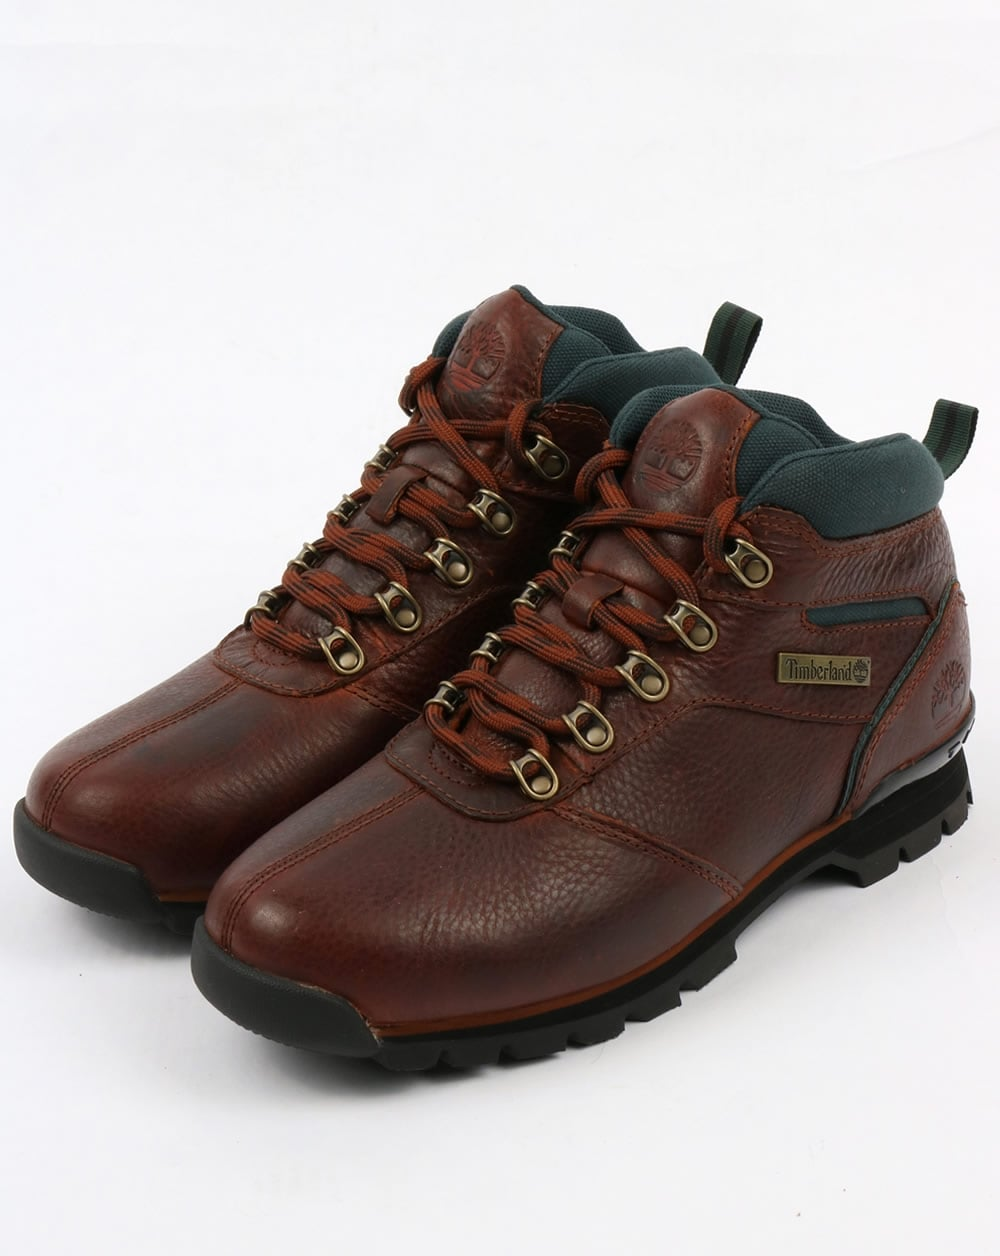 Timberland Splitrock Ii Boots Brown Green 2 Pro Shoes